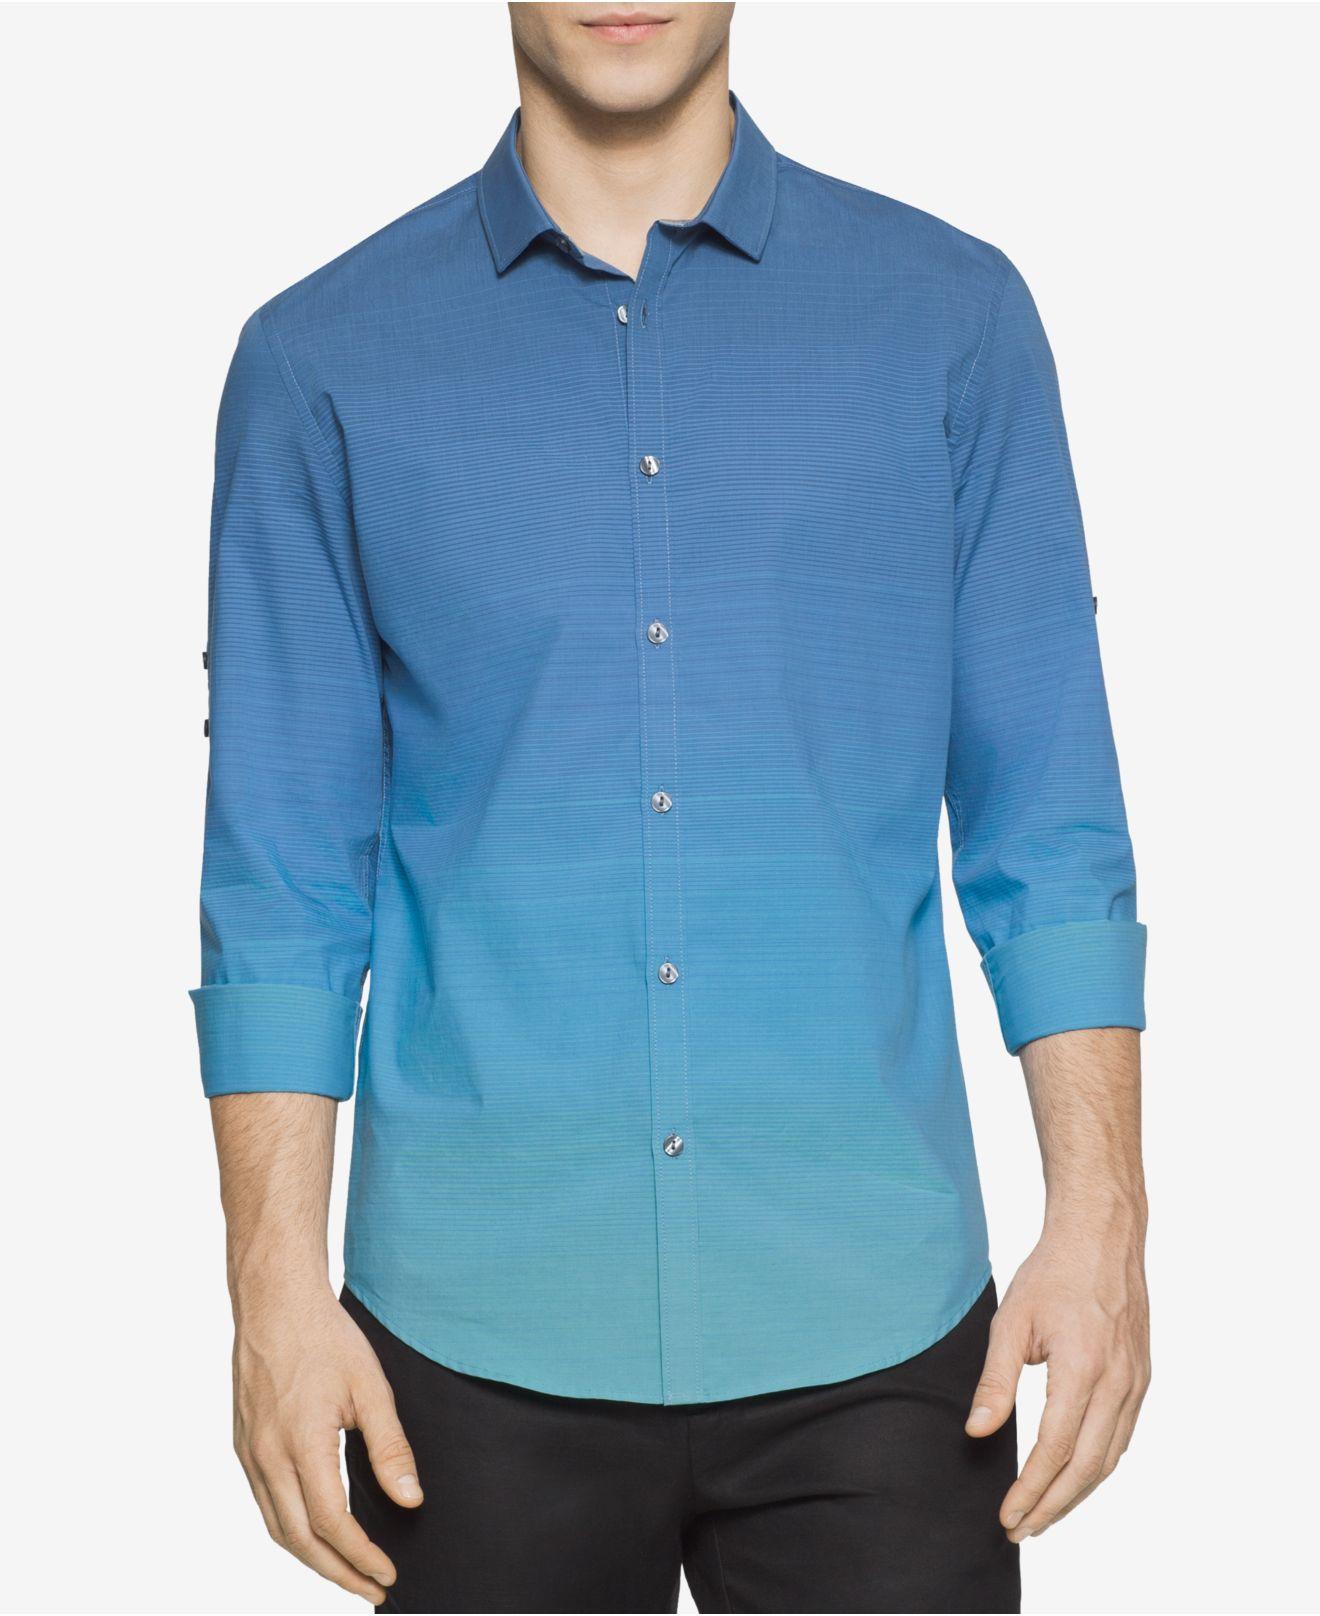 Calvin klein men 39 s slim fit colorblocked horizontal for Horizontal striped dress shirts men